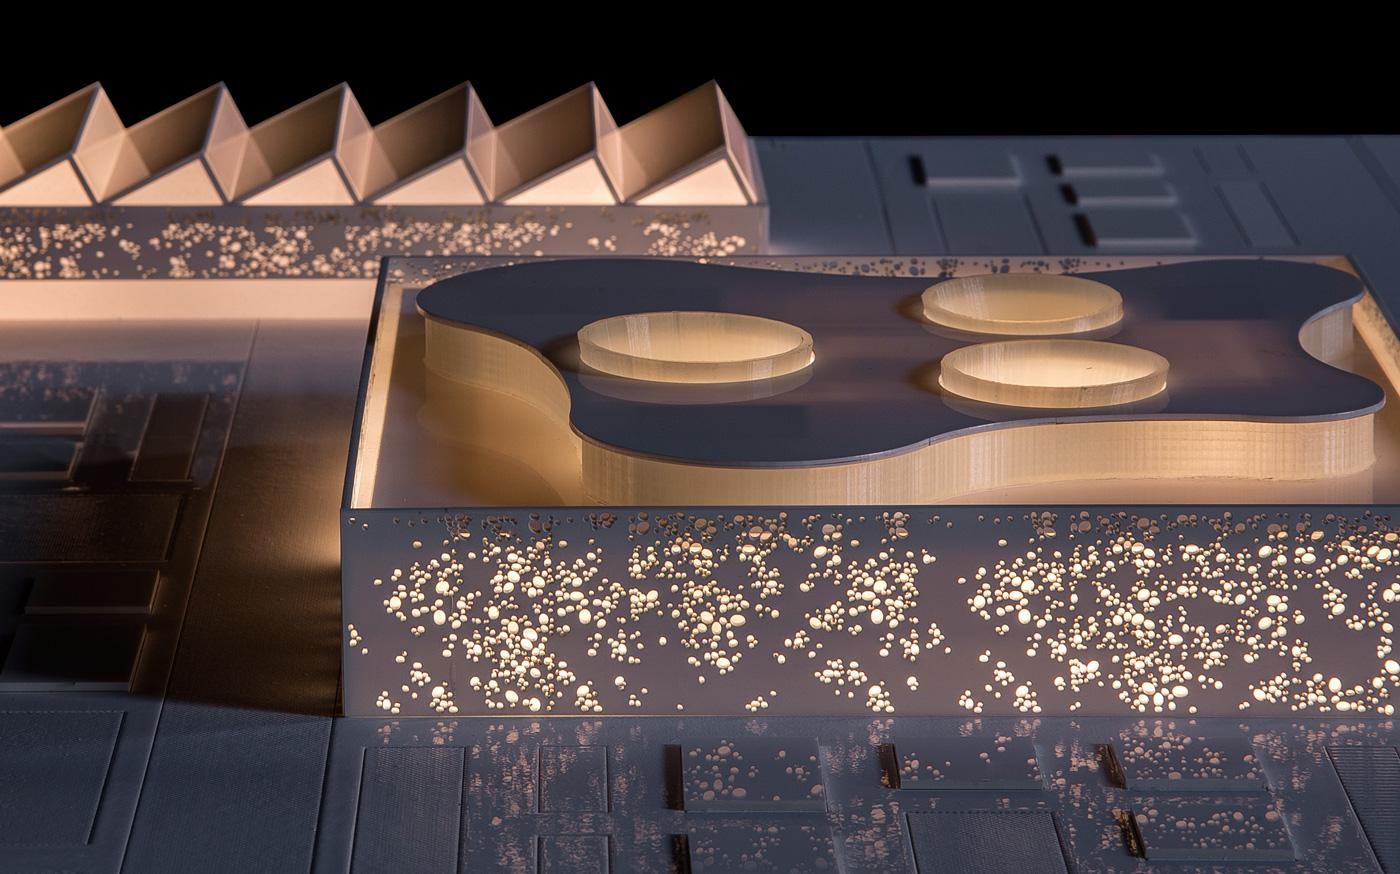 maqueta-arquitectura-concurso-valencia-iluminada-pfc-centro-musical-4